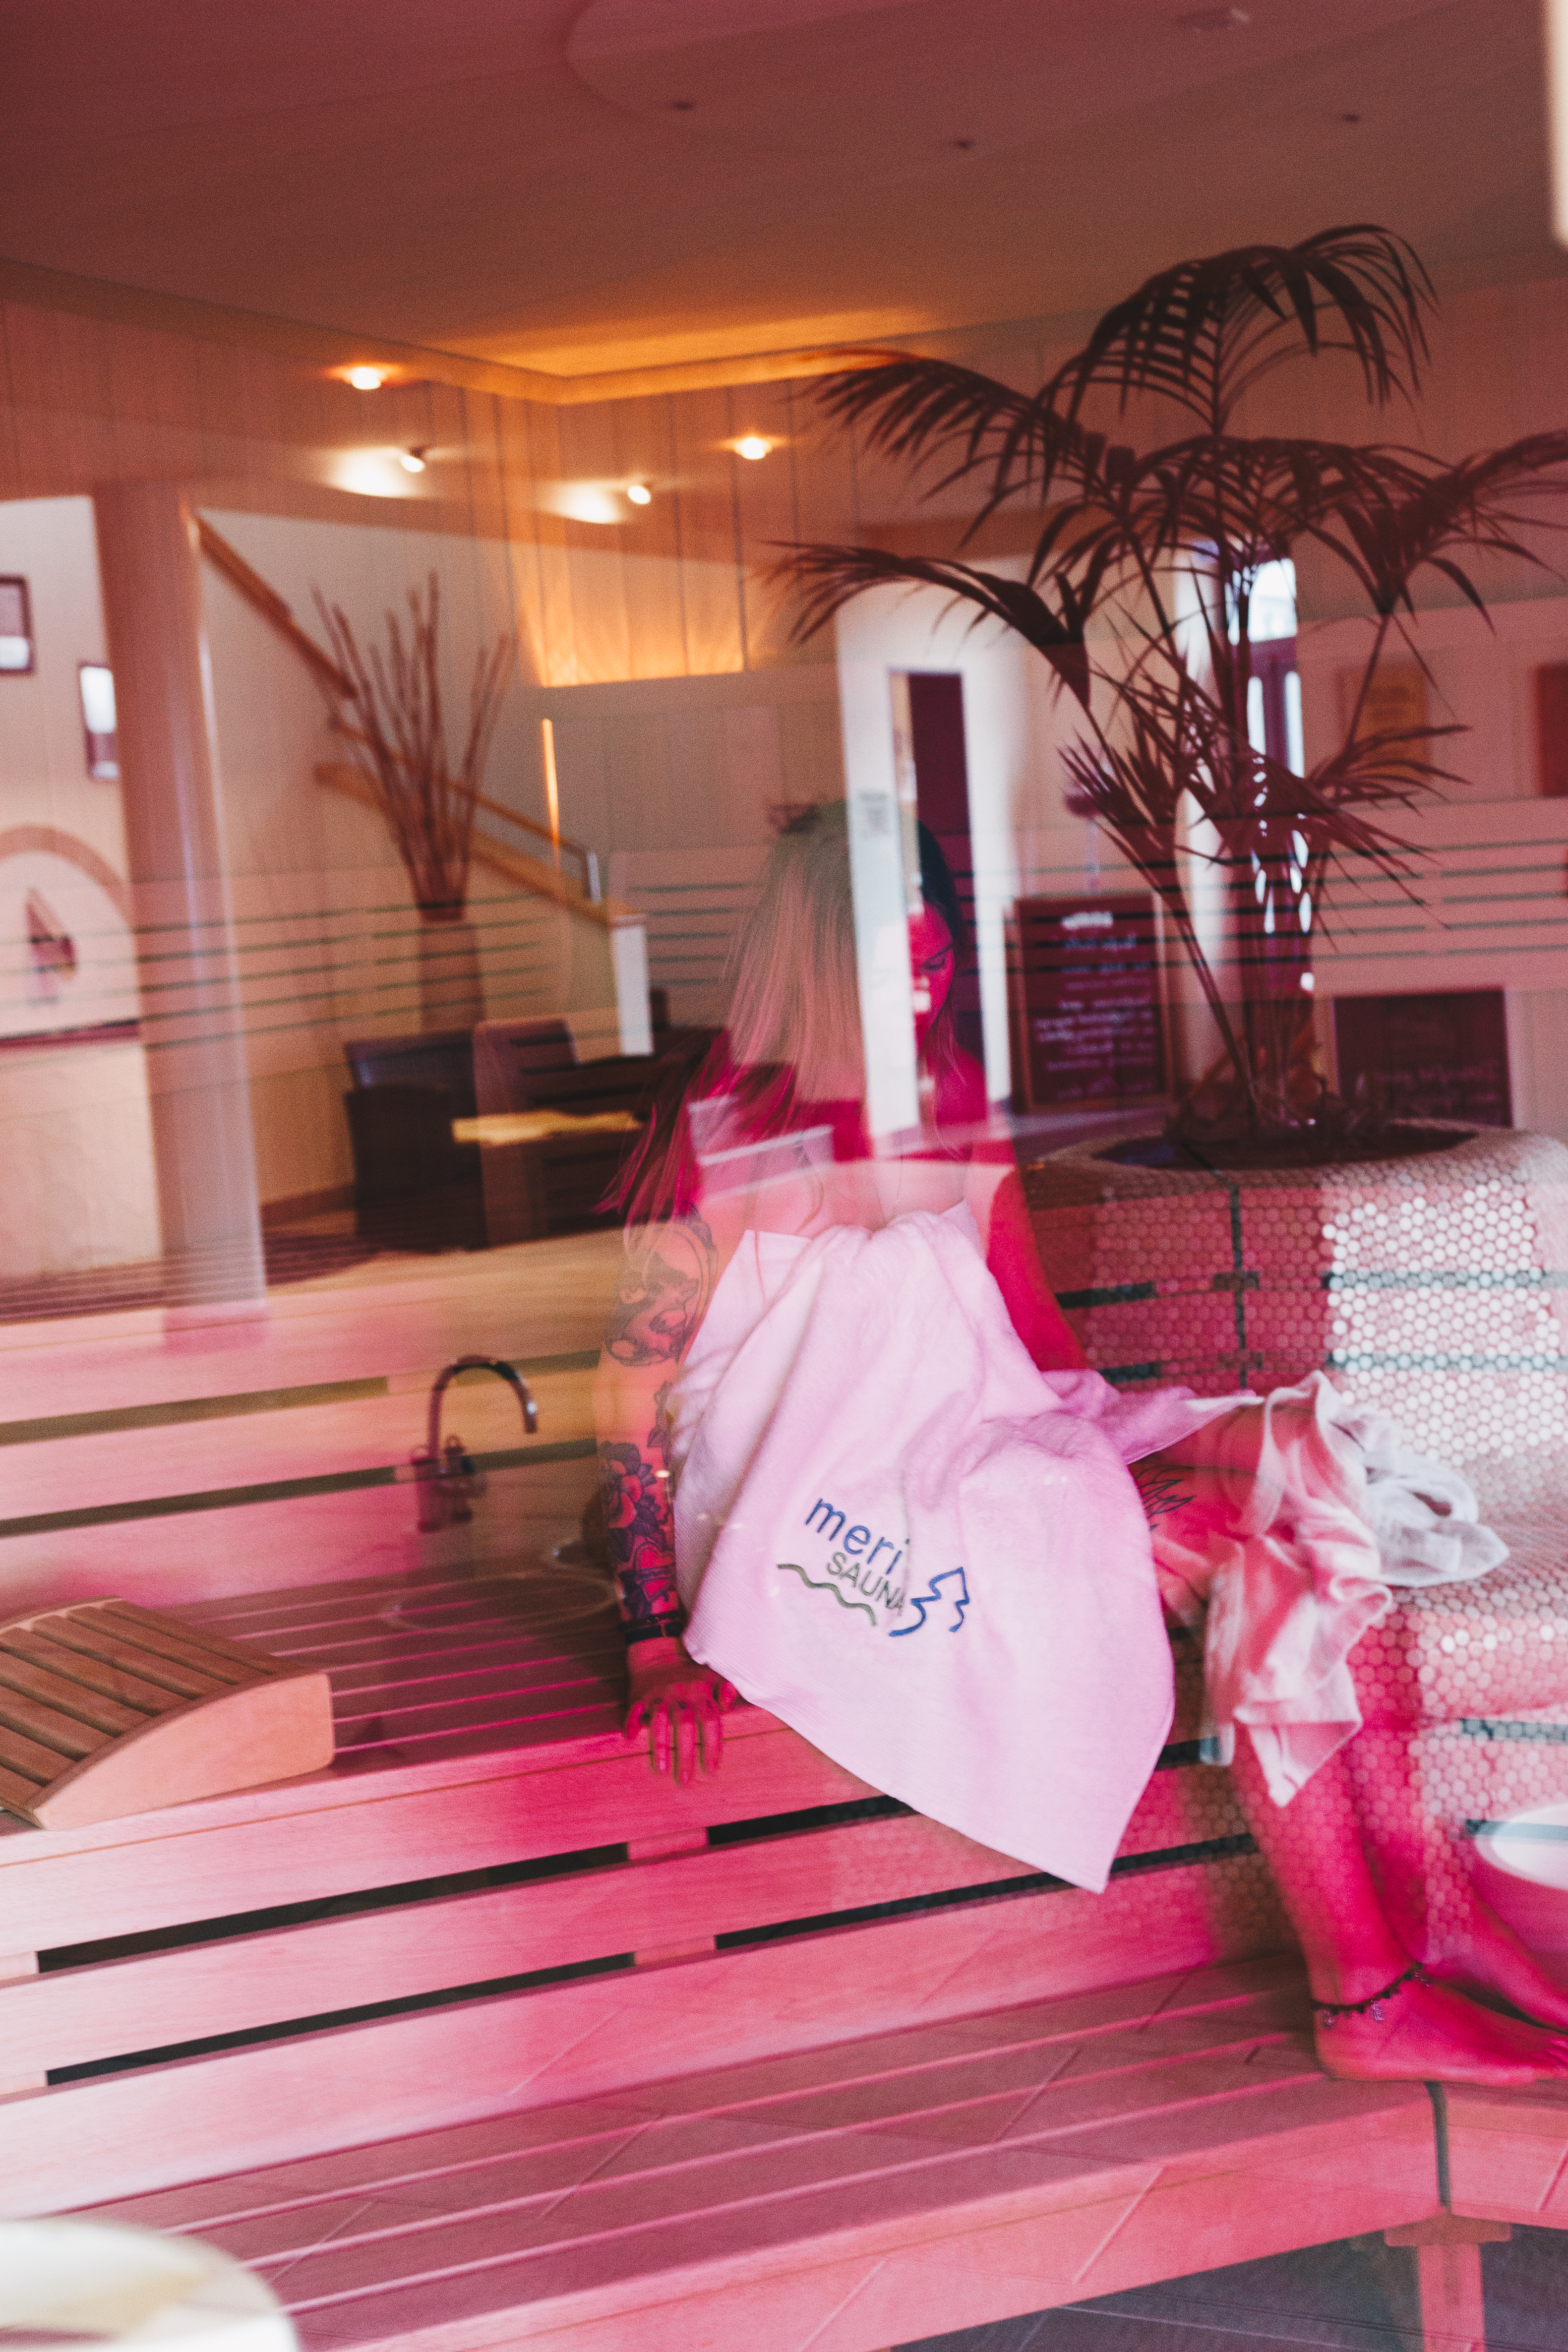 meri sauna-annabelle sagt-leipzig9